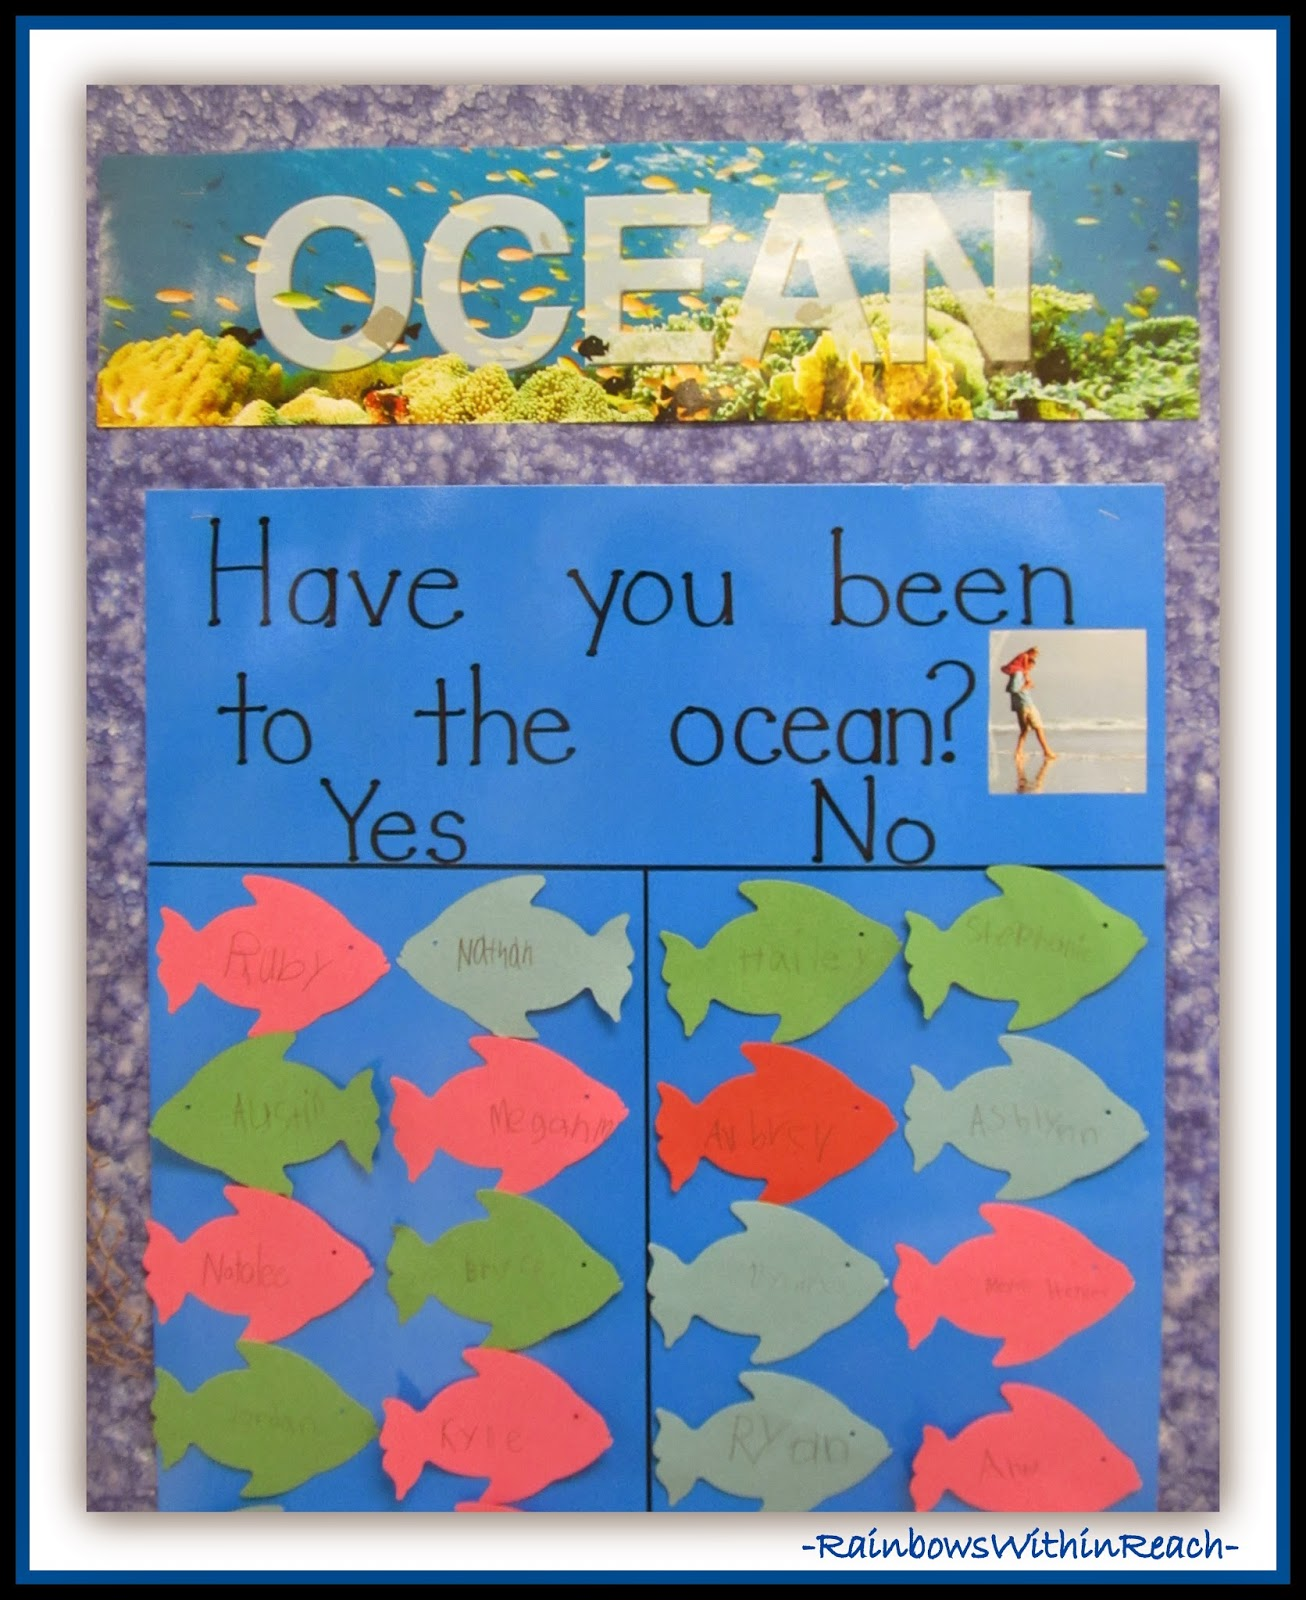 Rainbowswithinreach Ocean Creatures In Children S Art Freebie Mp3